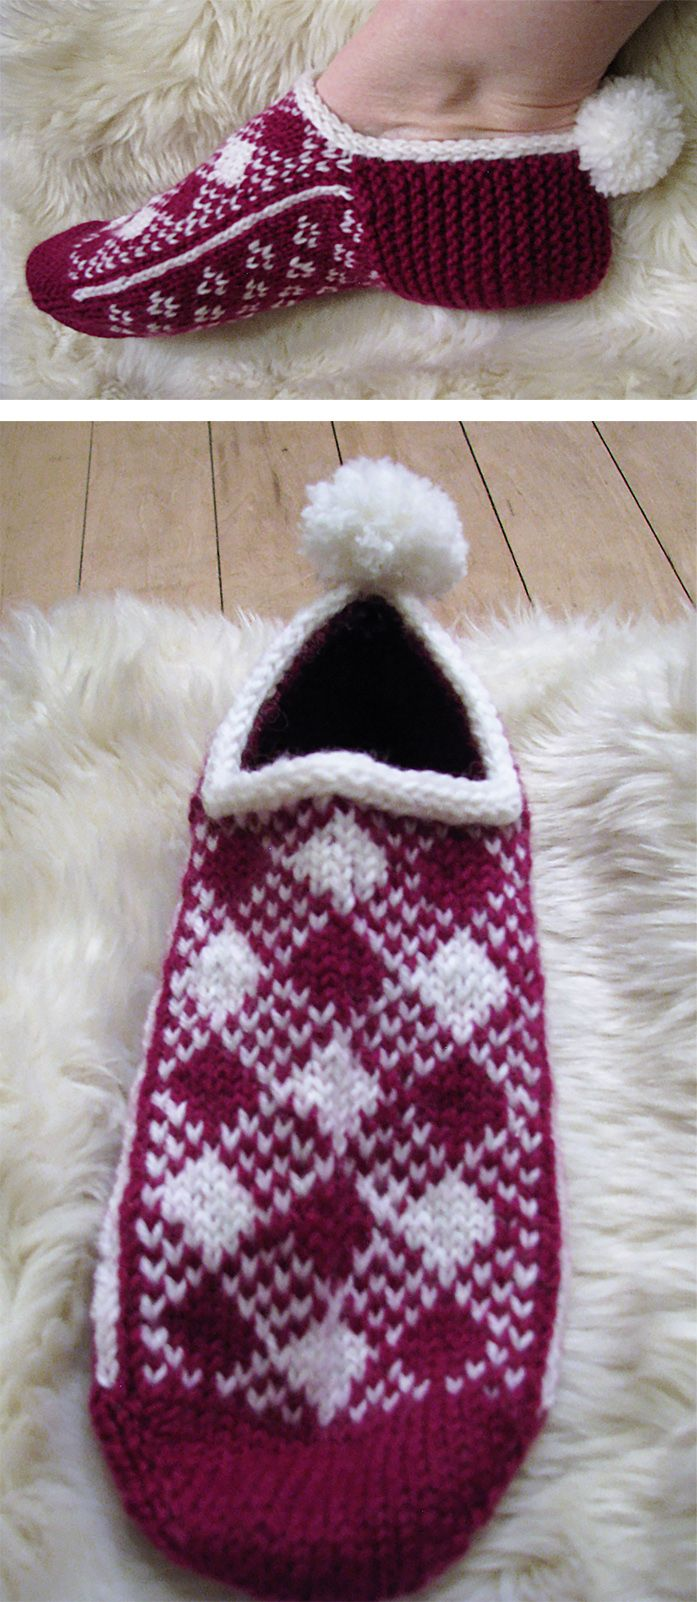 Free Knitting Pattern for Shepherd\'s Plaid Slippers - Fair isle ...